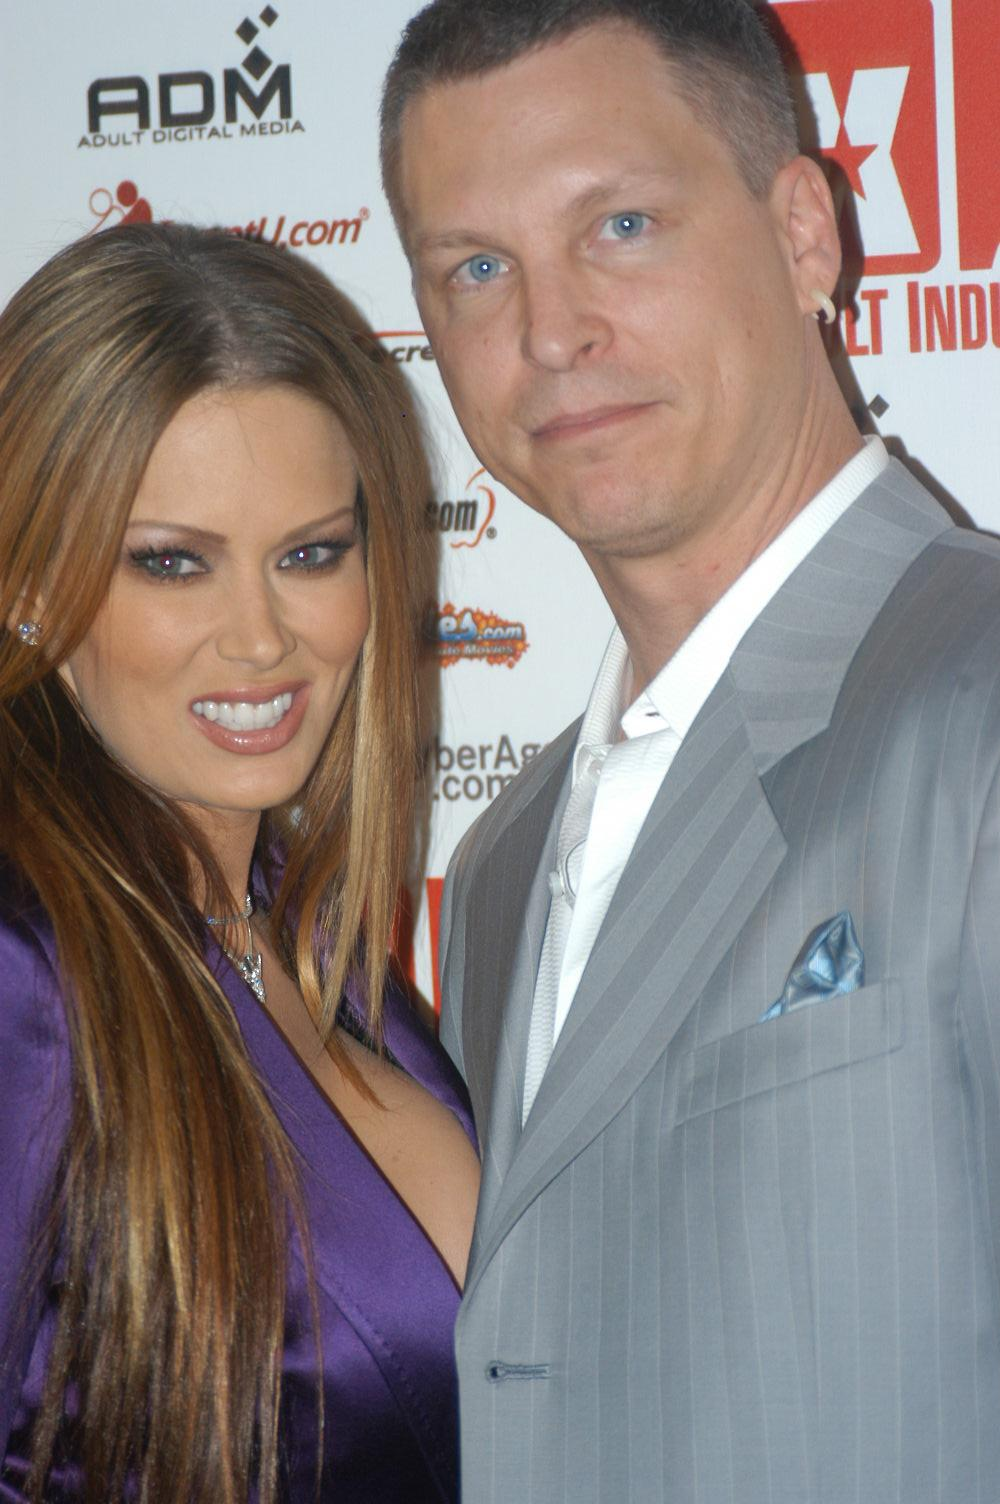 With former husband Jay Grdina, at the XBIZ Award, November 2005